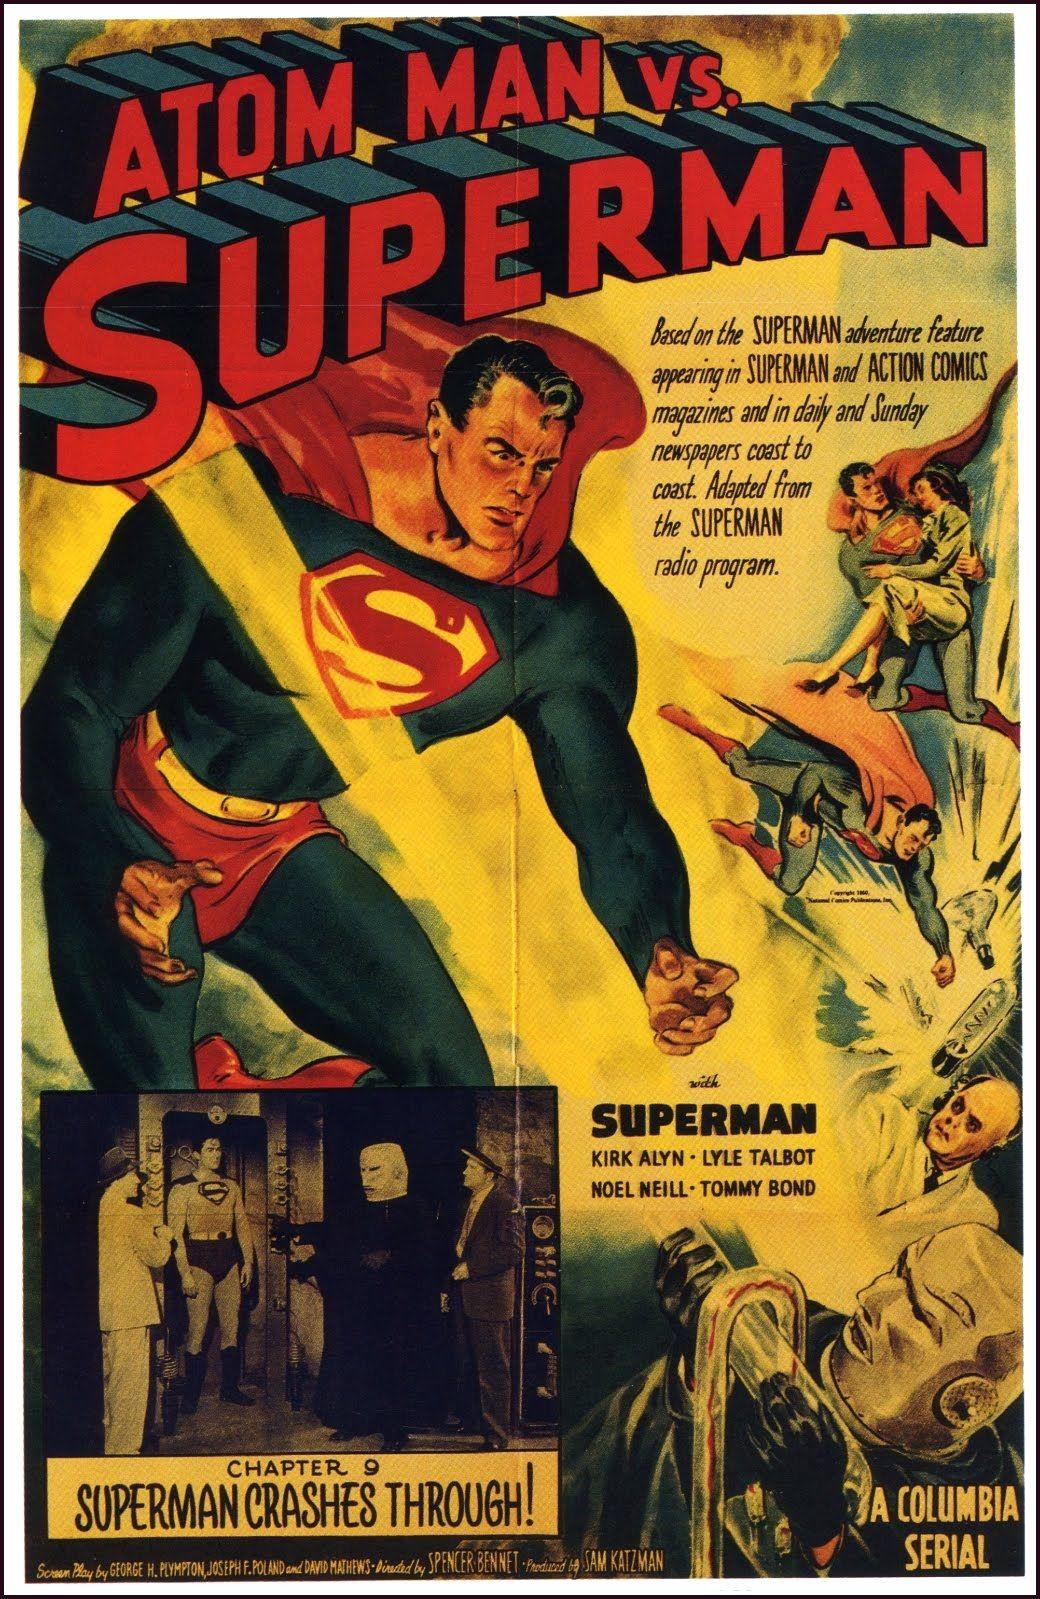 Superman 1950 Comic Atom Man vs. Superman ...